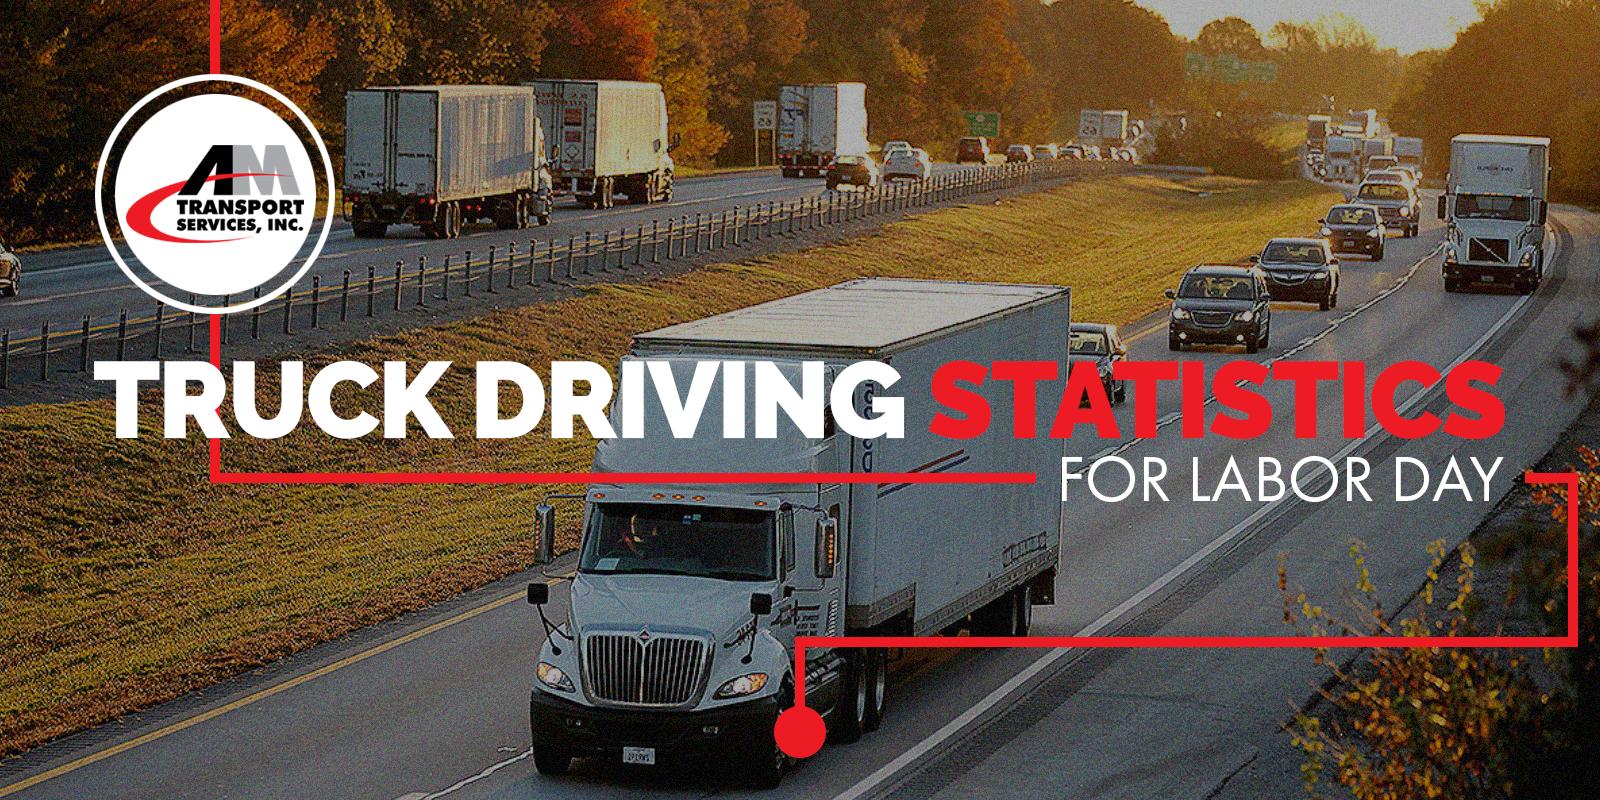 Truck Driving Statistics